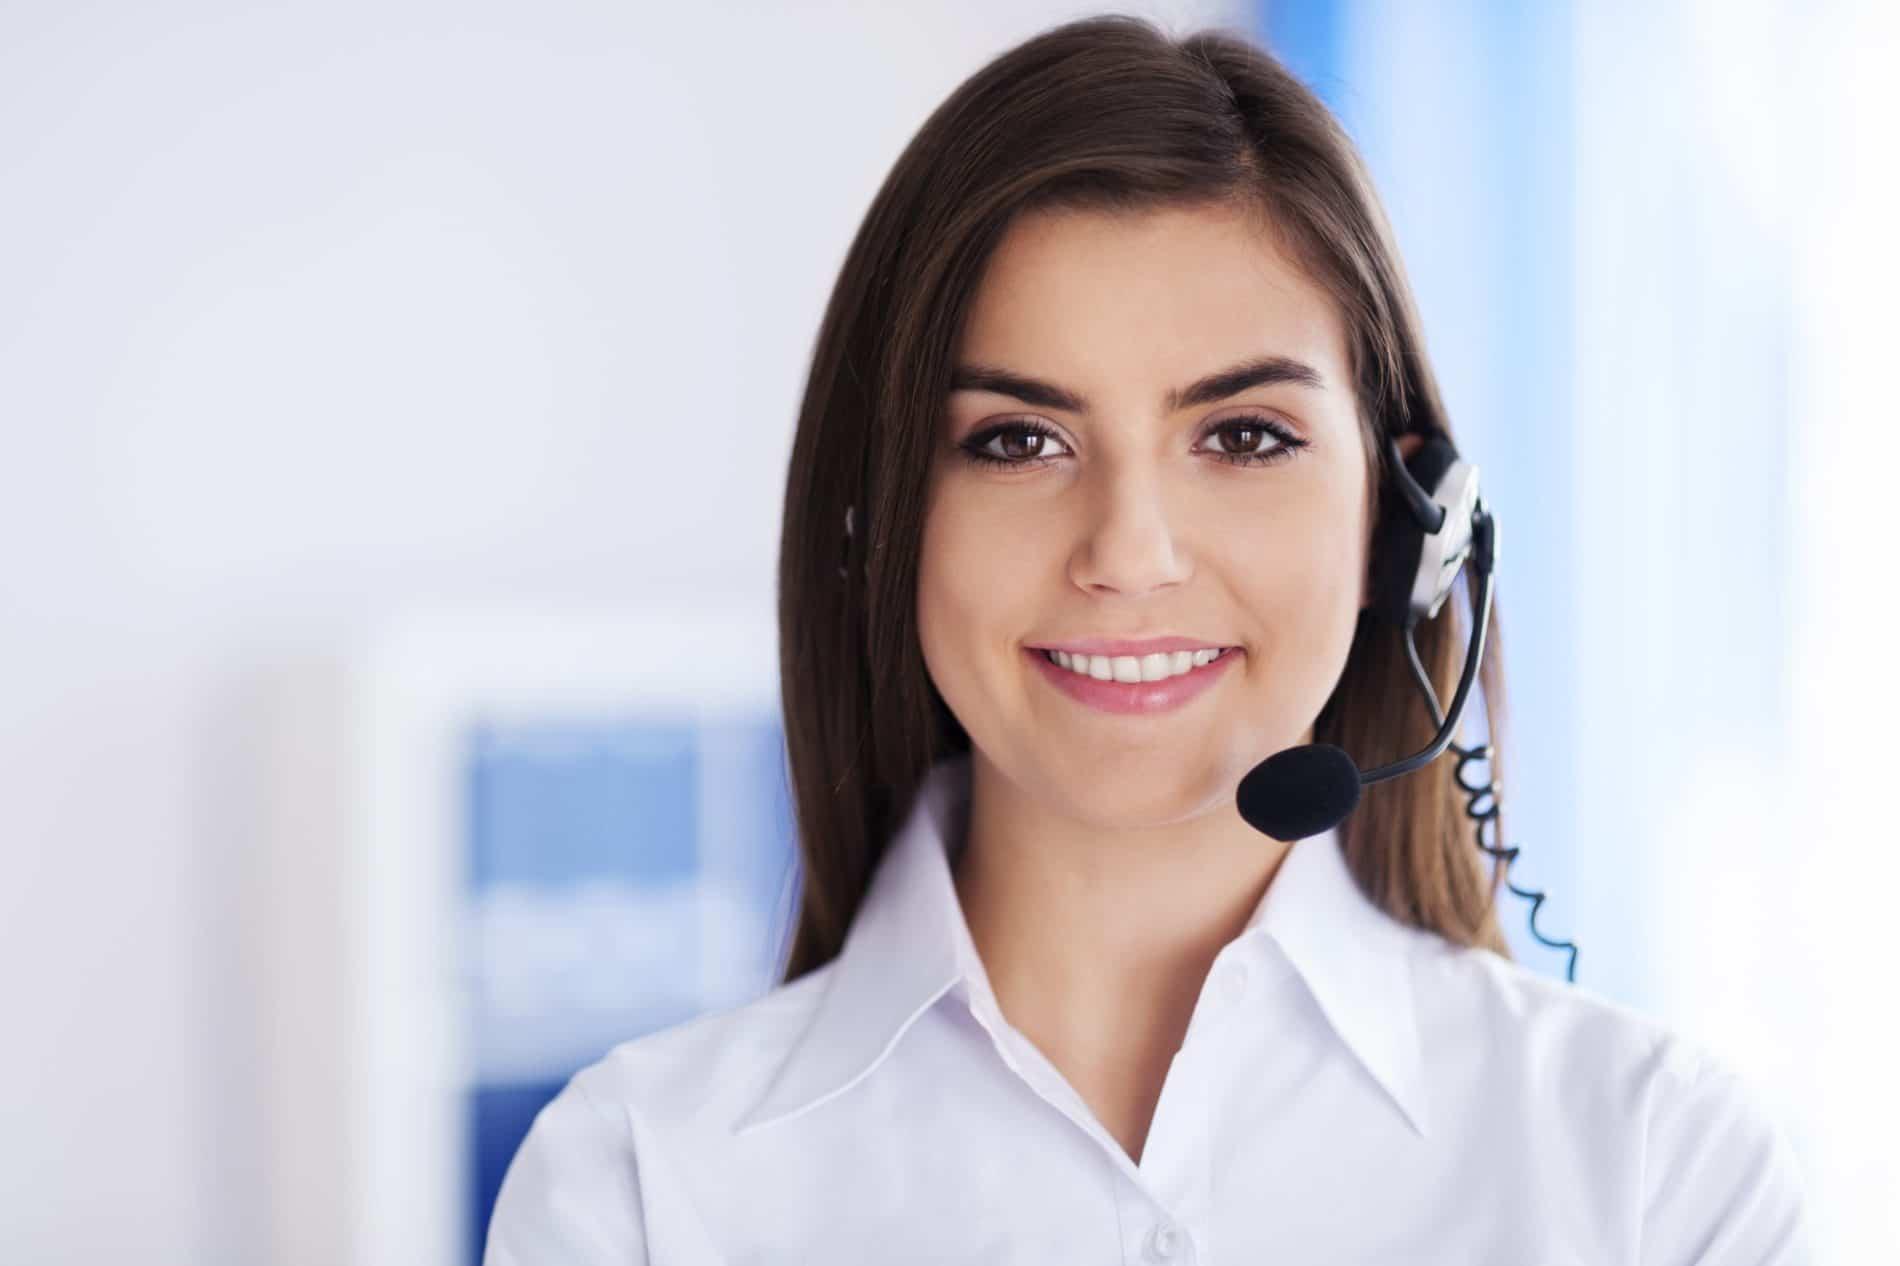 Telephone answering service in Walnut Creek, California